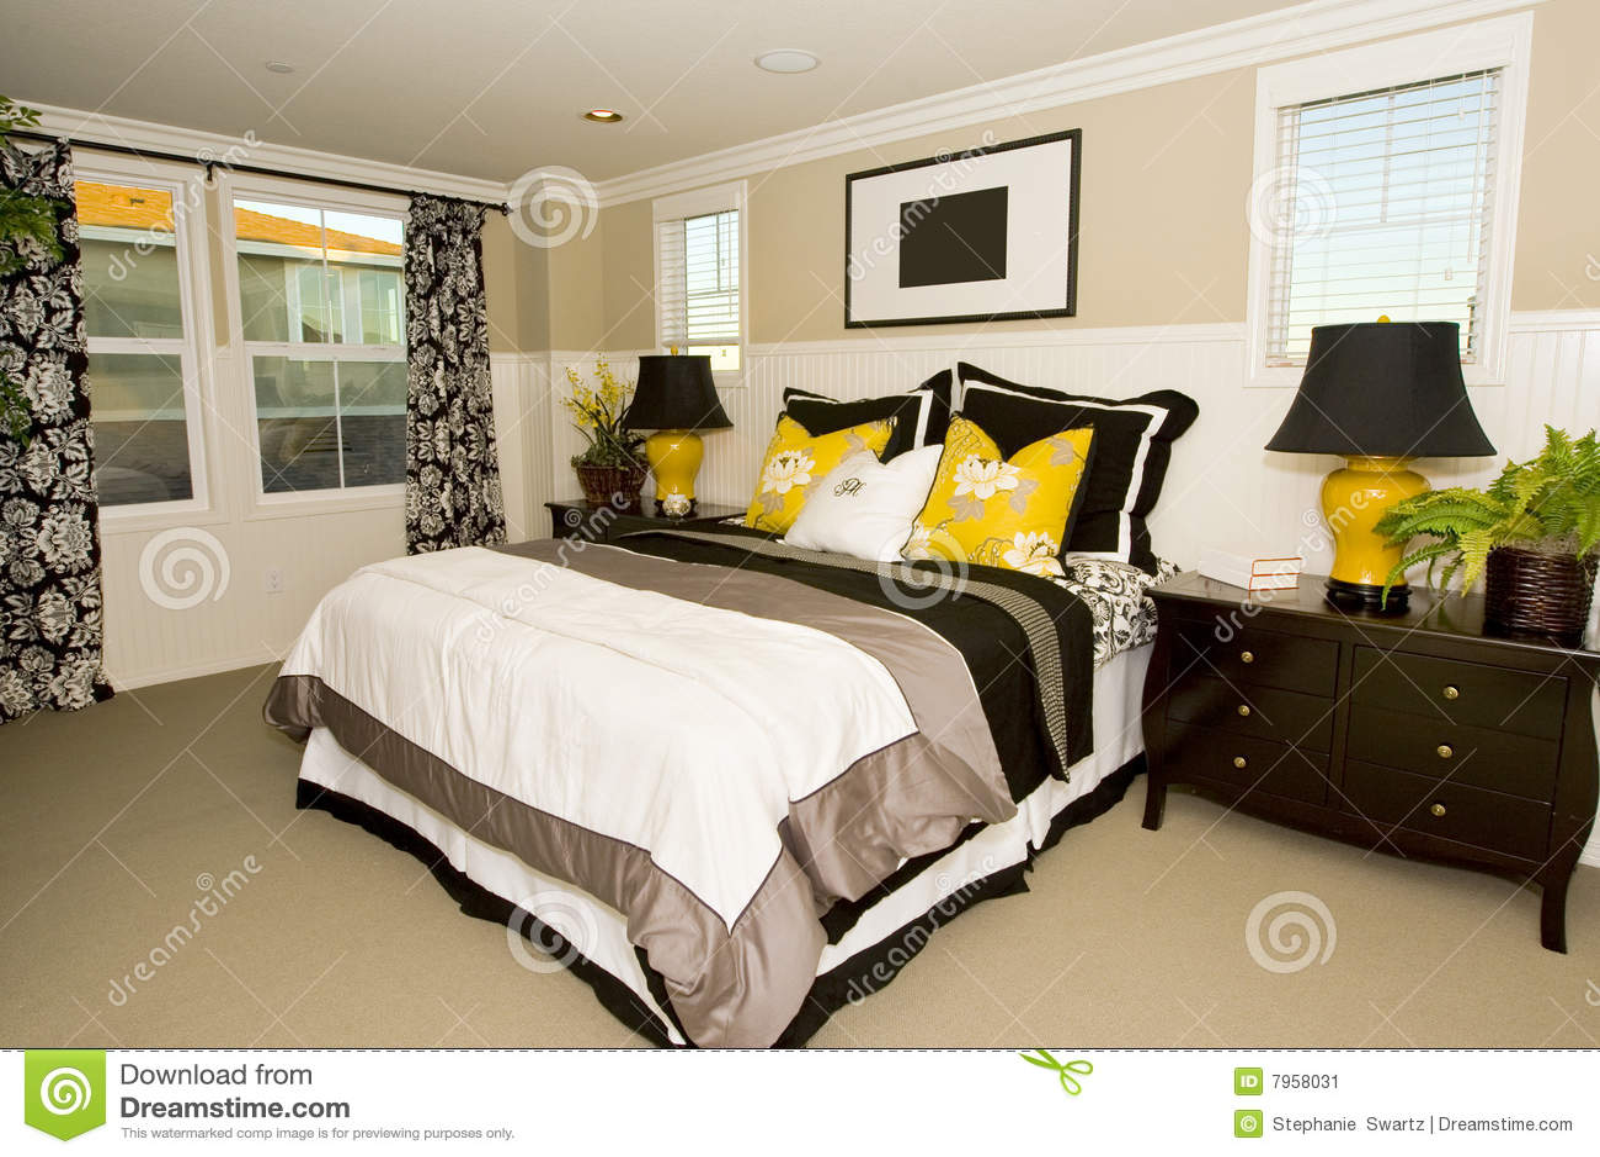 Elegant Master Bedroom Stock Image - Image: 7958031